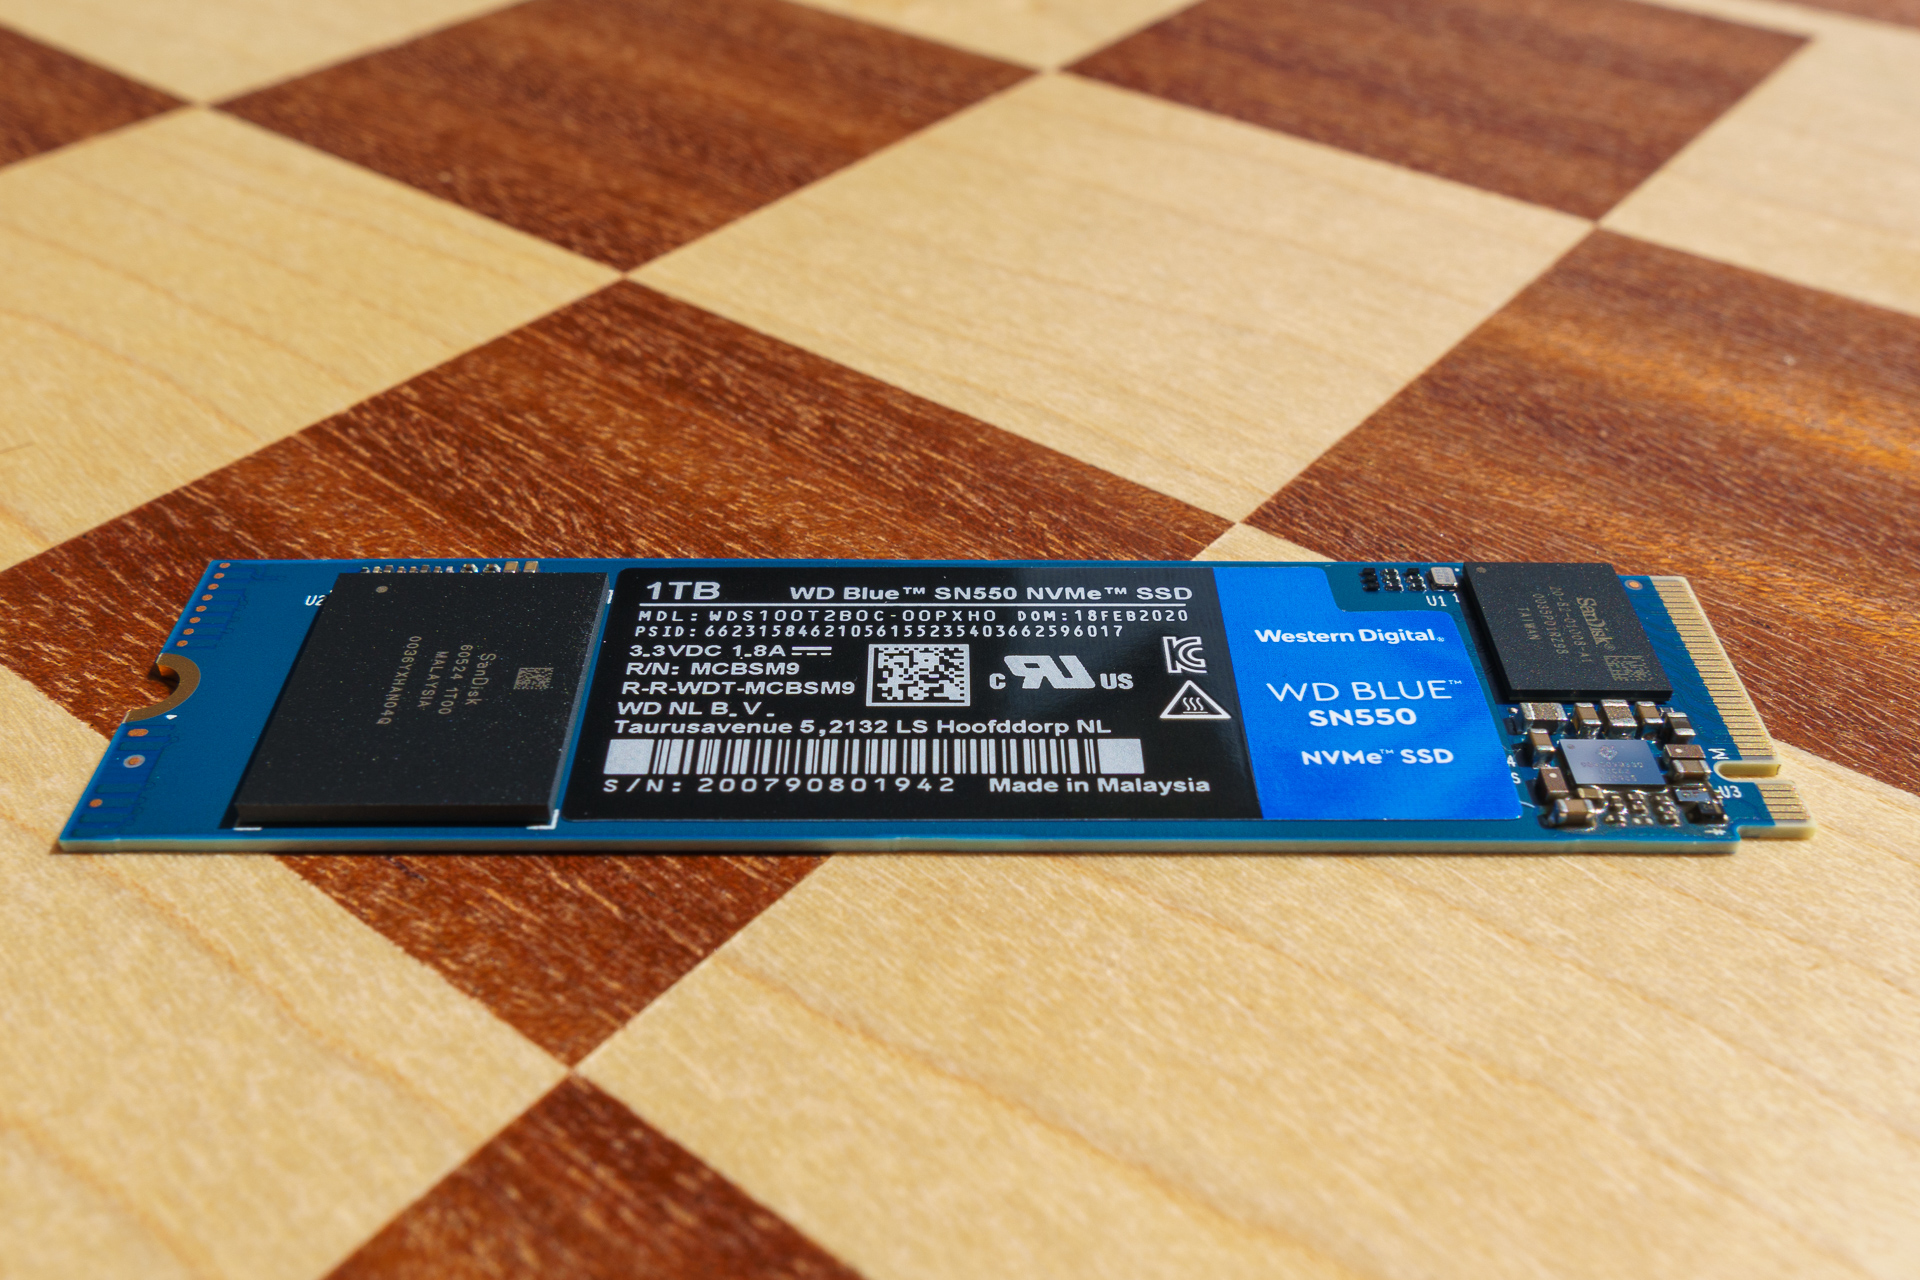 Dysk SSD Western Digital Blue SN550 - solidny średniak 20